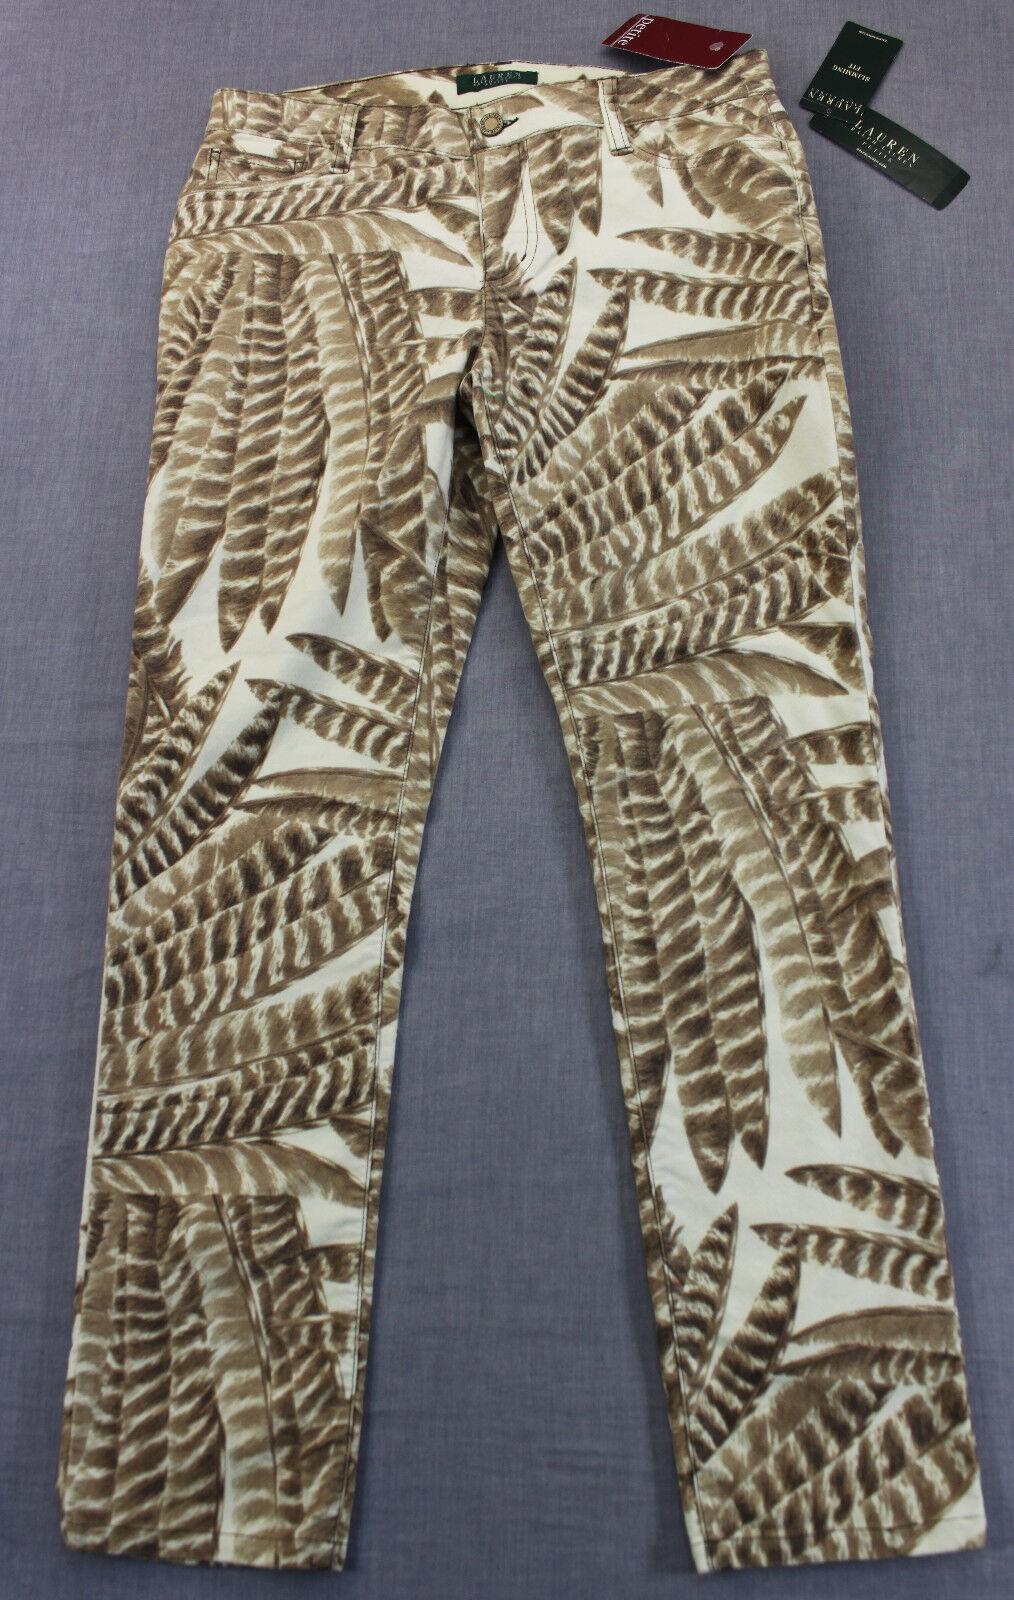 RALPH LAUREN Womens JUNGLE PRINT Slimming Stretch PANTS NWT 6P Petite 31x29  119